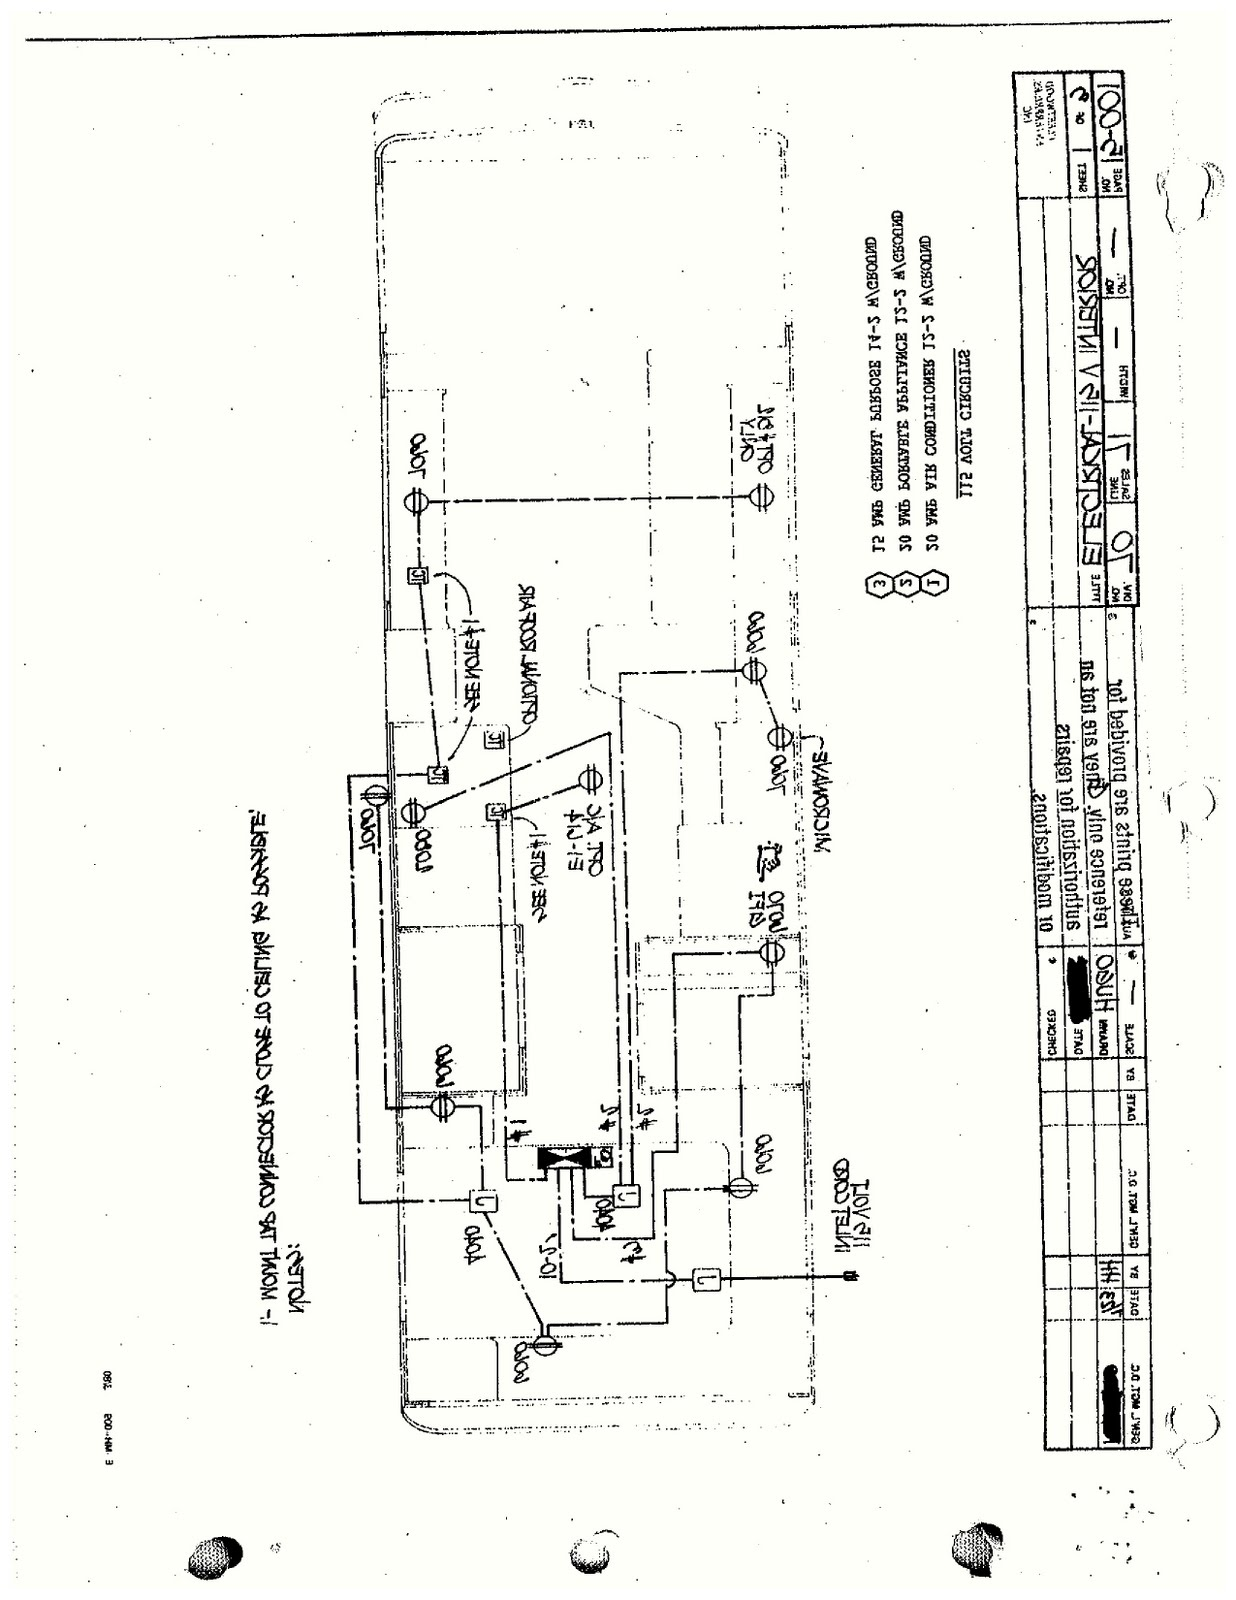 medium resolution of 1987 coleman pop up camper wiring diagram somurich com fleetwood travel trailer wiring fleetwood